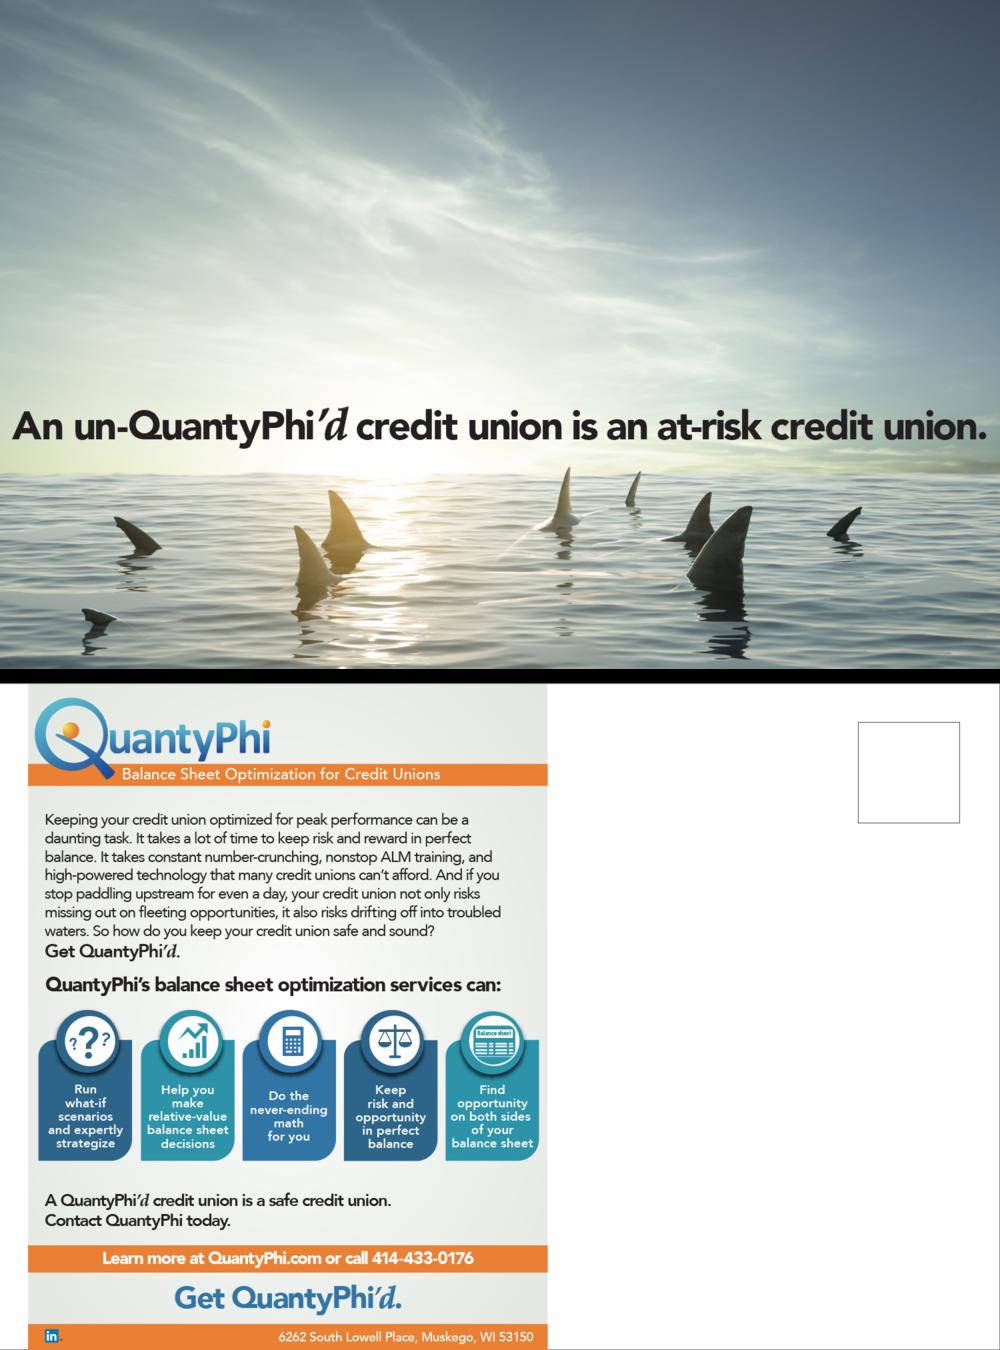 QuantyPhi_Postcards_At-Risk_Sharks_072417.png